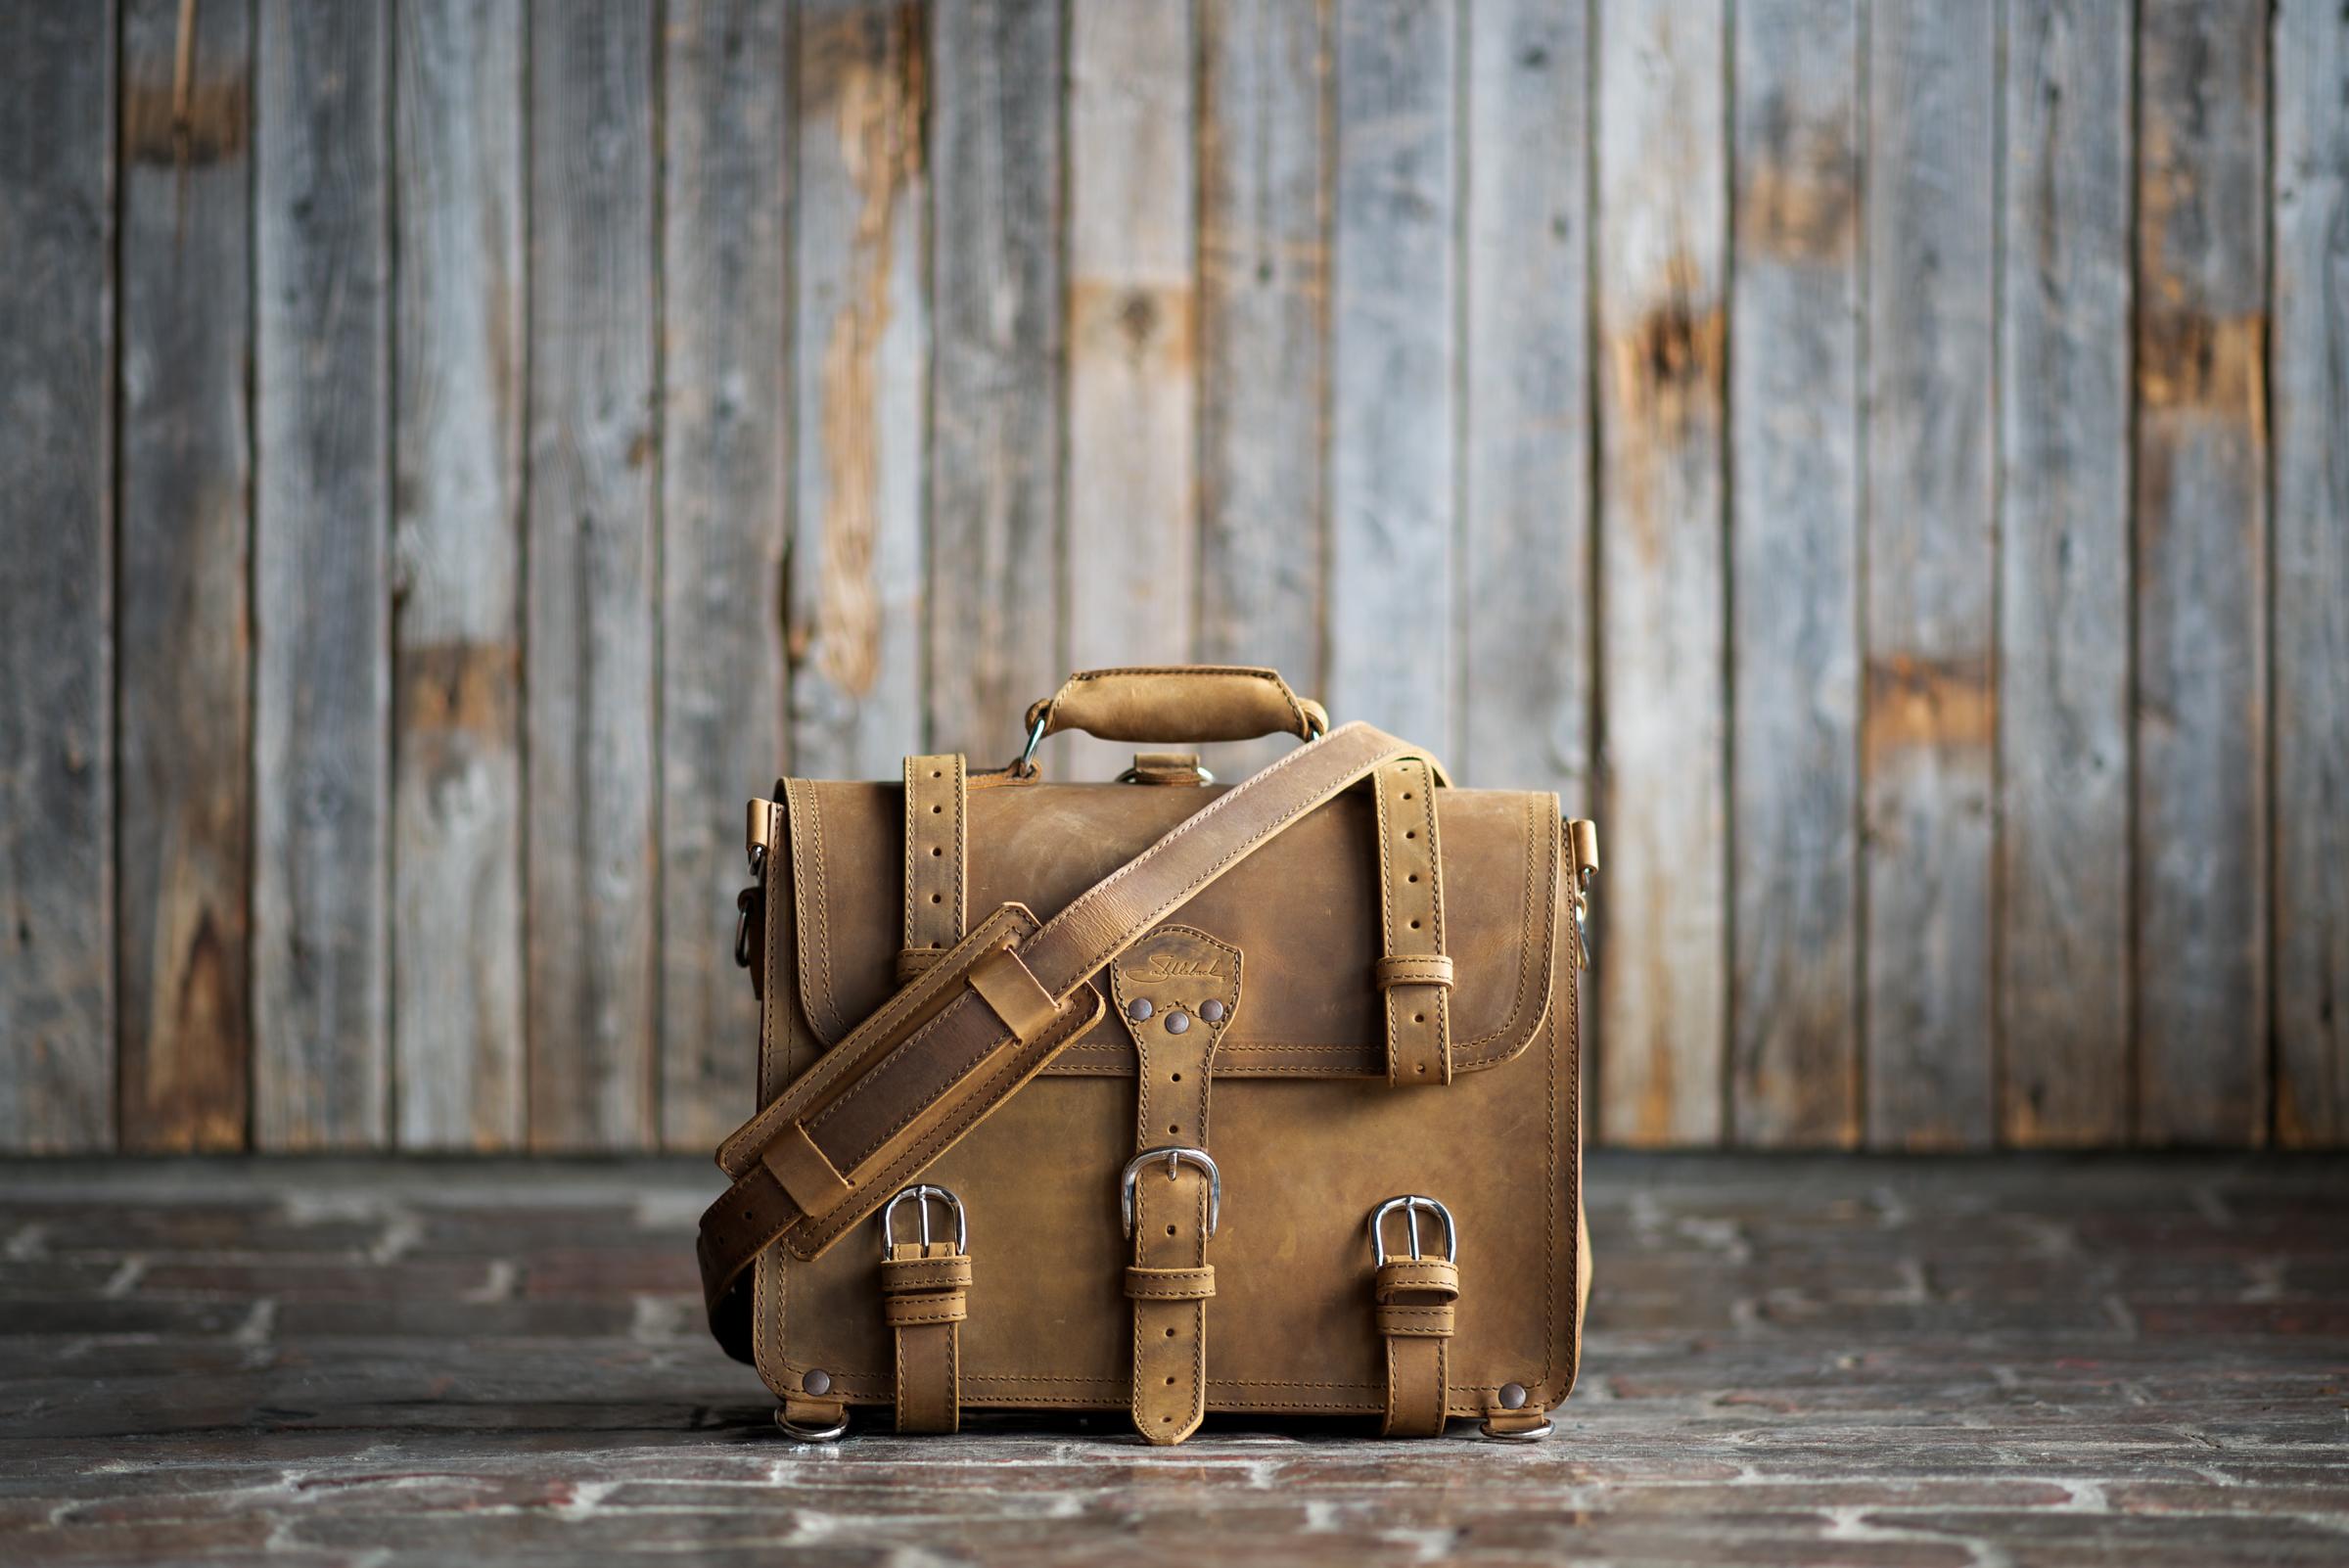 briefcase-tobacco-01.jpg